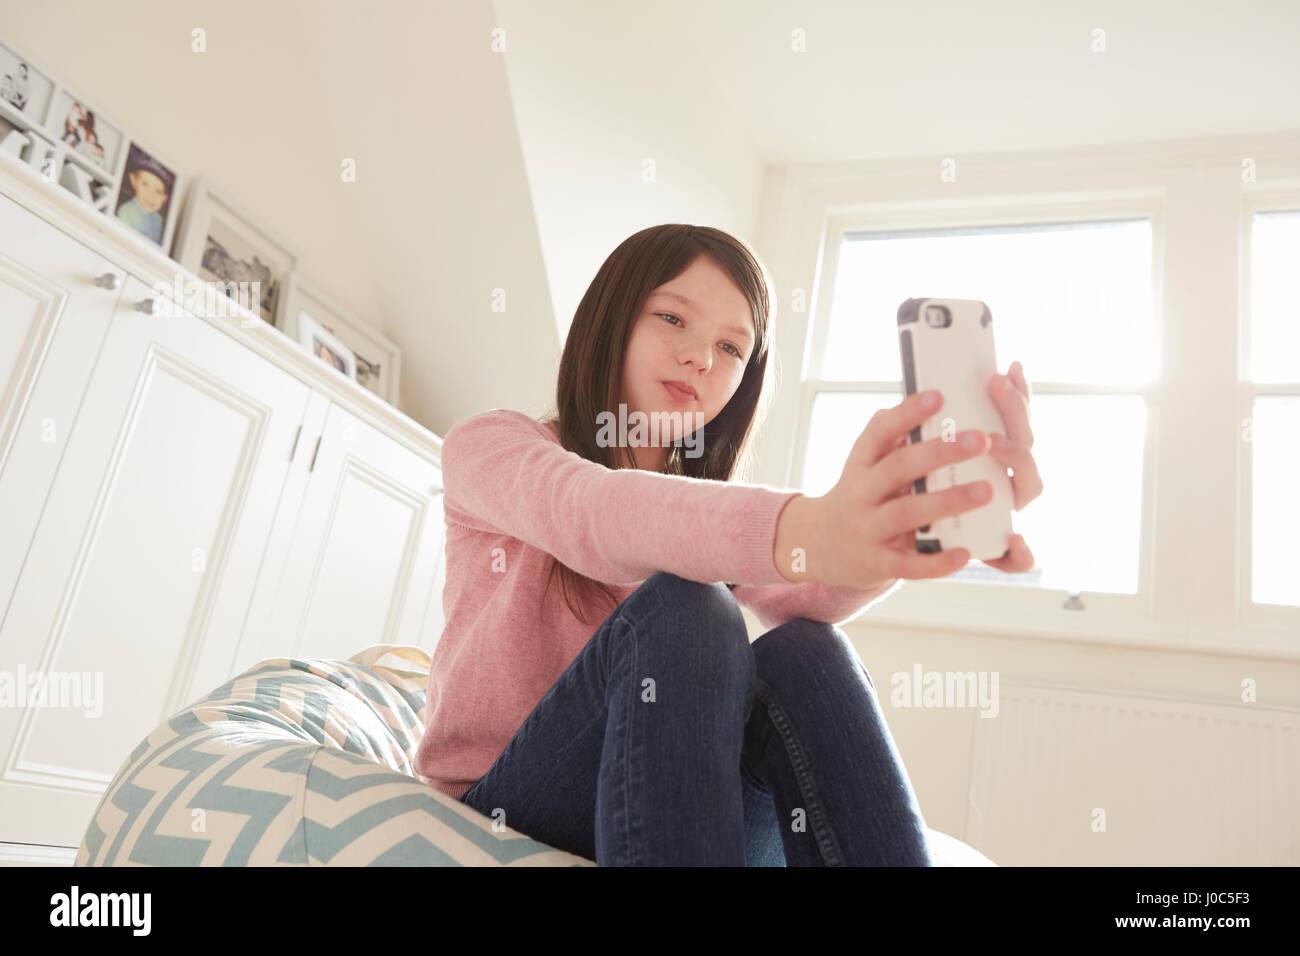 Girl sitting on beanbag chair taking smartphone selfie - Stock Image